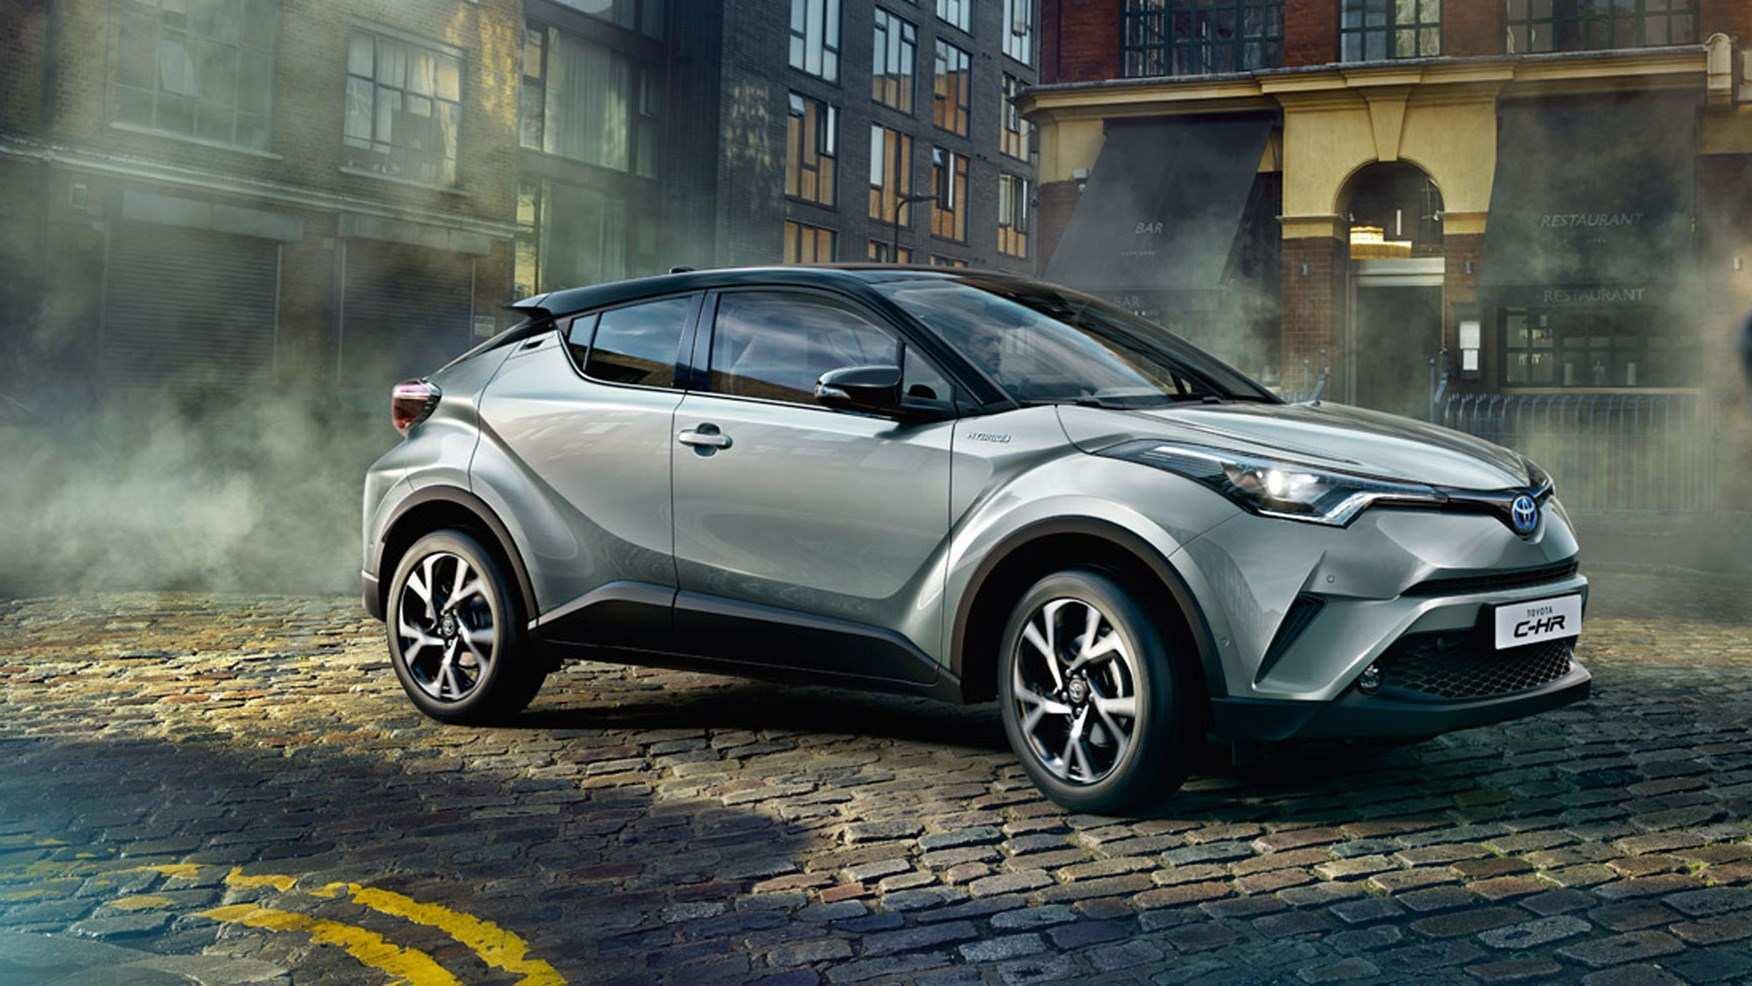 62 Concept of Best Iq Toyota 2019 New Engine Rumors for Best Iq Toyota 2019 New Engine